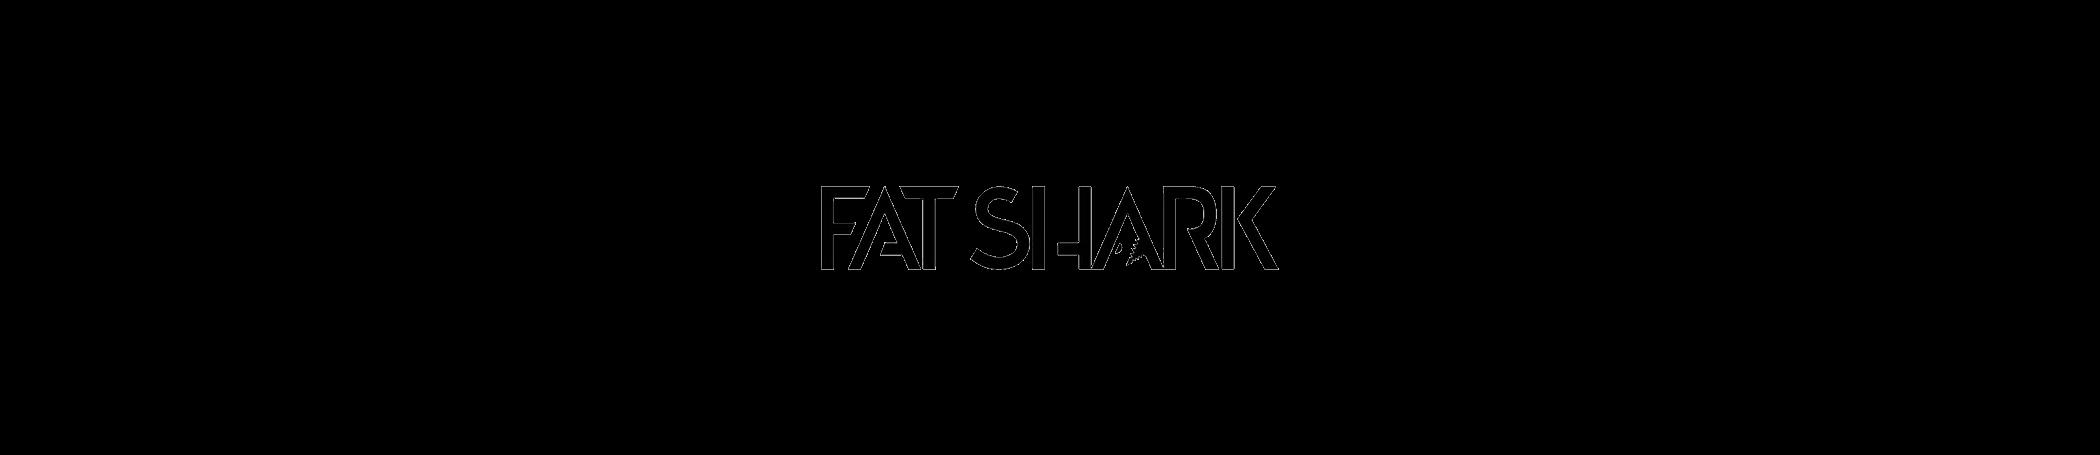 fatshark fpv banner promotion shop description mantisfpv